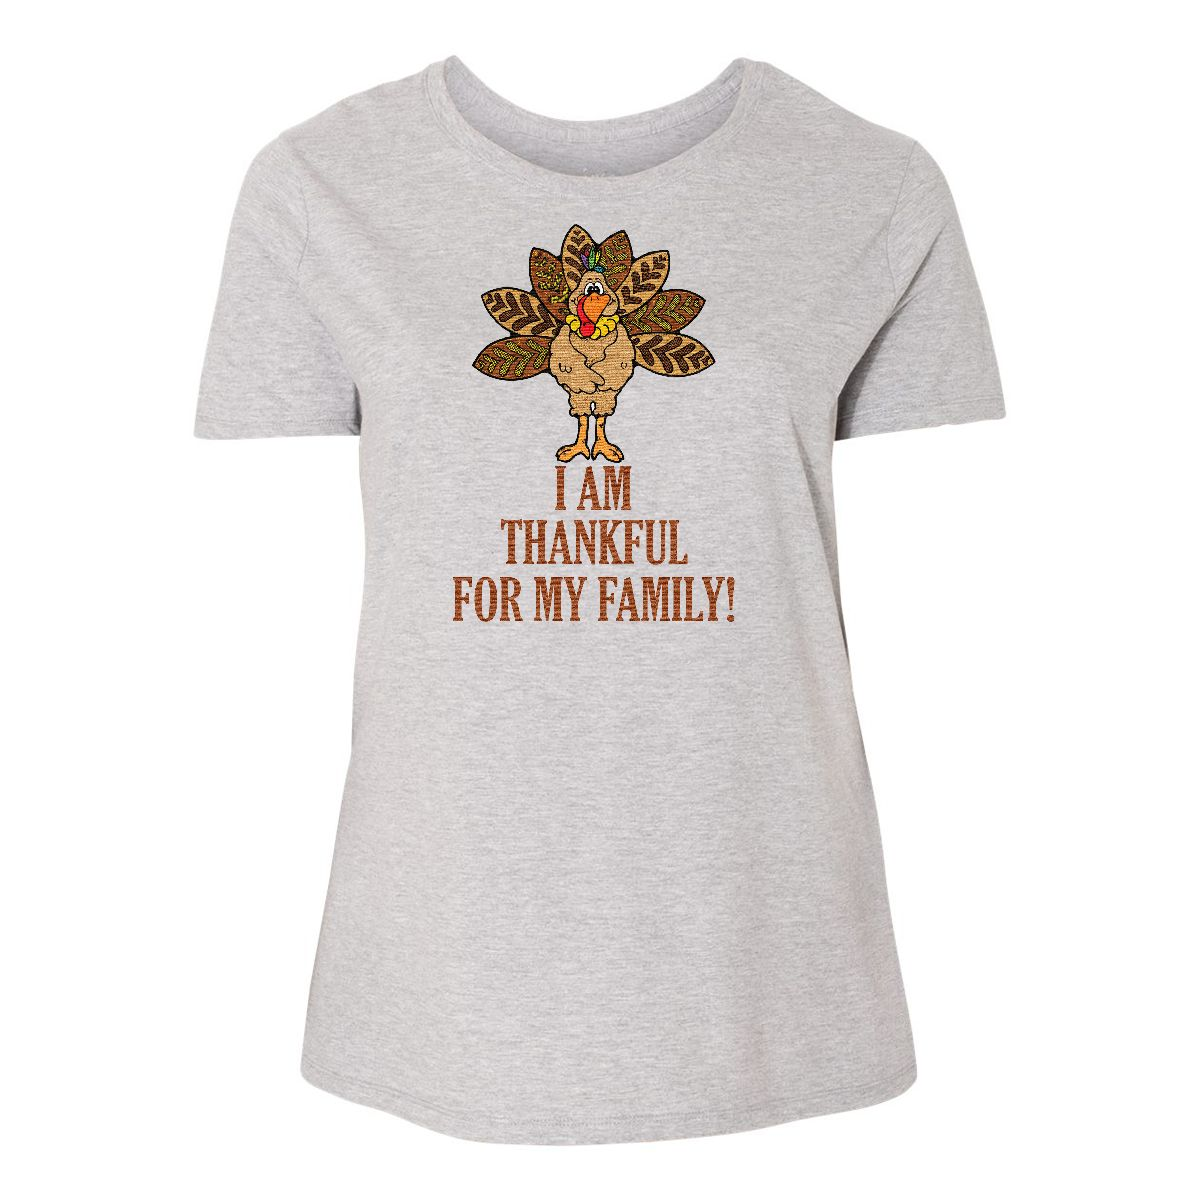 bd3a53bde Inktastic Turkey Thankful Women's Plus Size T-Shirt Thanksgiving ...